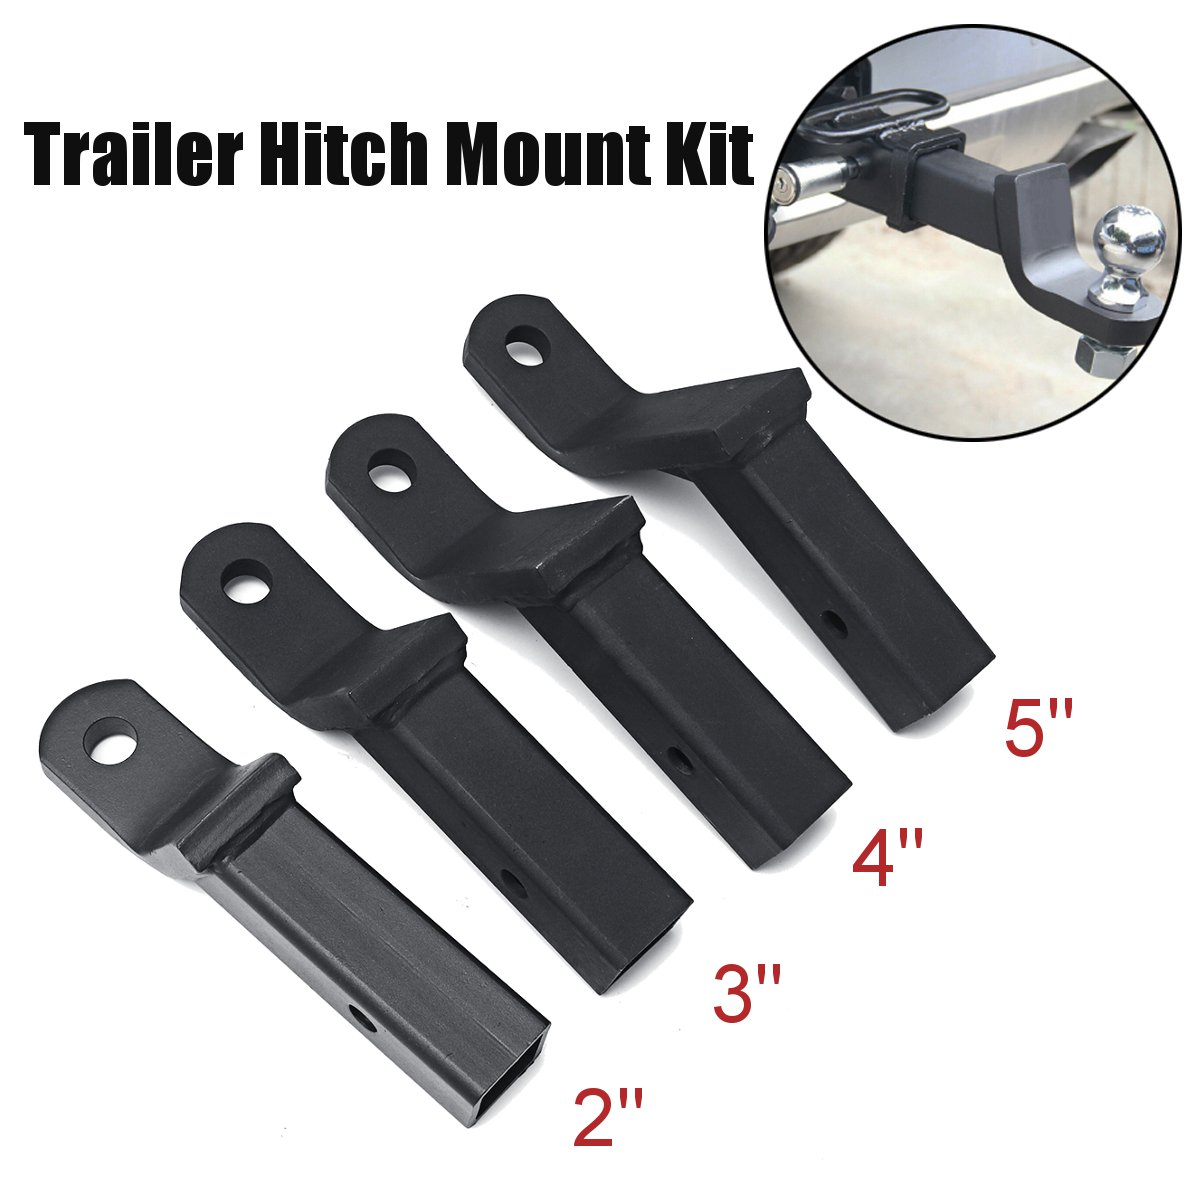 "500LB Truck Trailer Hook Folding 2"" Trailer Hitch Mount Shank Adapter Cargo Wheelchair Carrier 2""/3 Car Trailer Parts Connector"